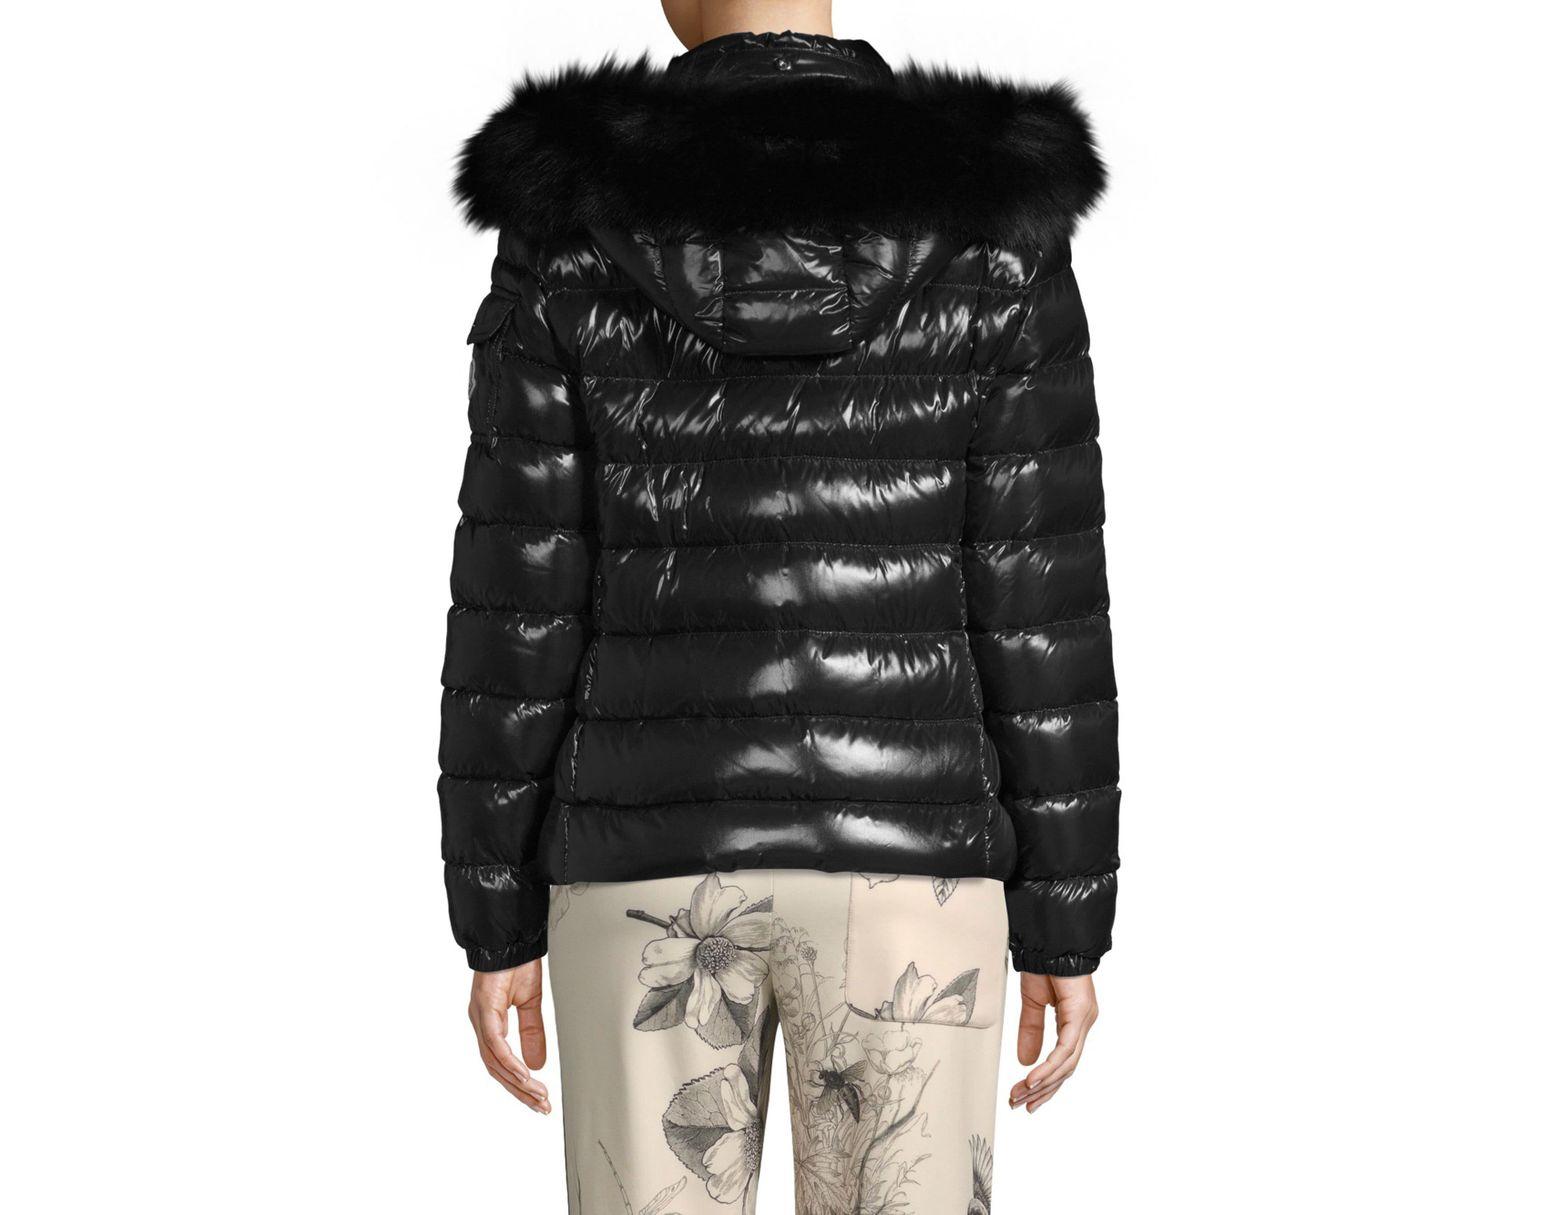 666265e1f Moncler Badyfur Fur-trim Puffer Jacket in Black - Save 13% - Lyst